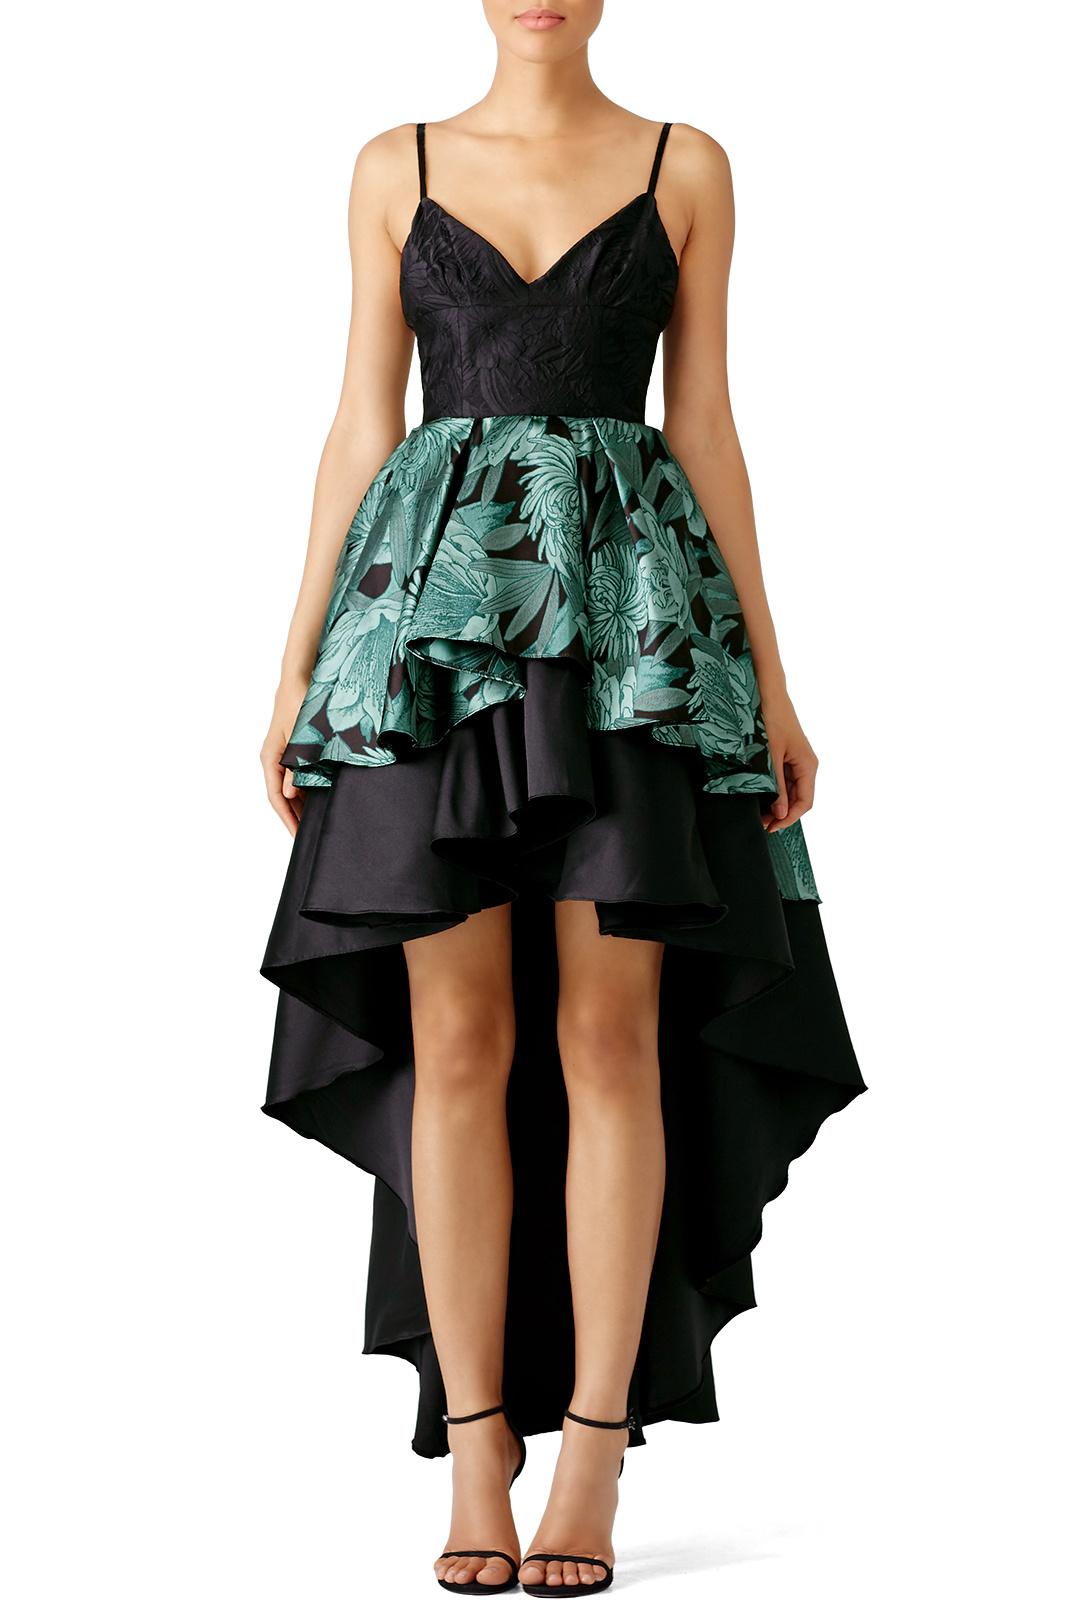 Gown: Christian Pellizzari via Rent the Runway